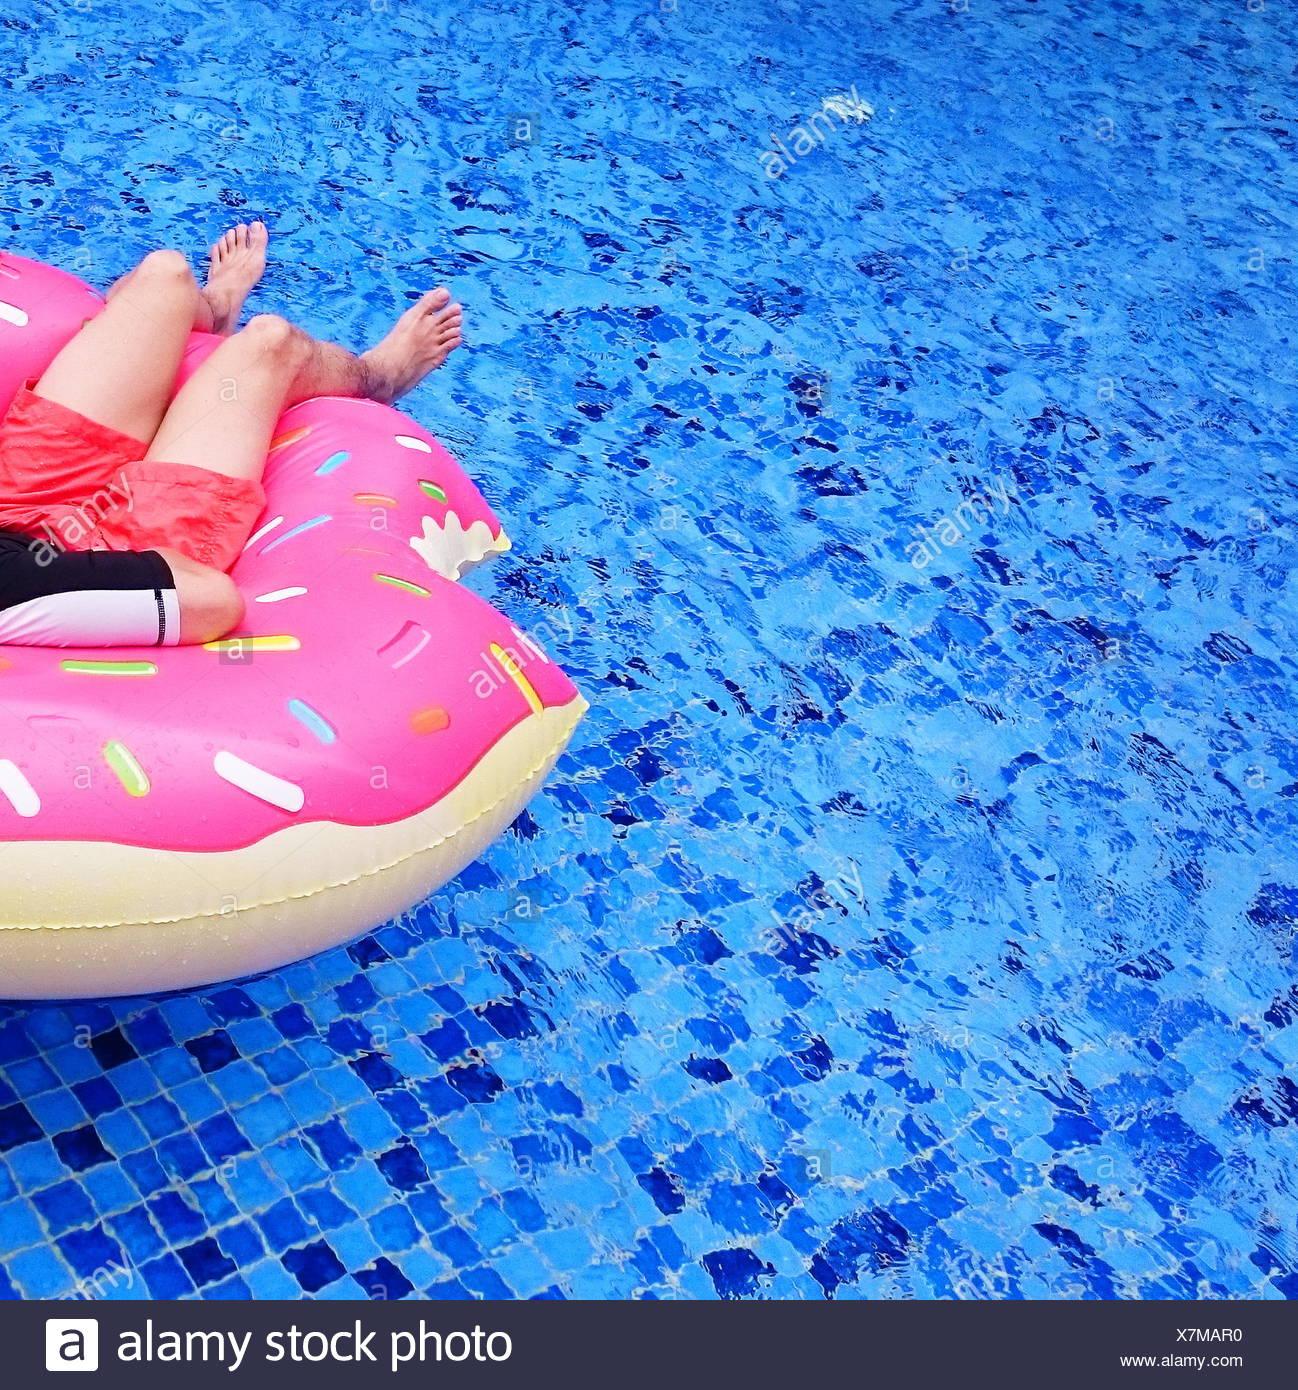 Hombre maduro relajante en donut inflable en una piscina Imagen De Stock